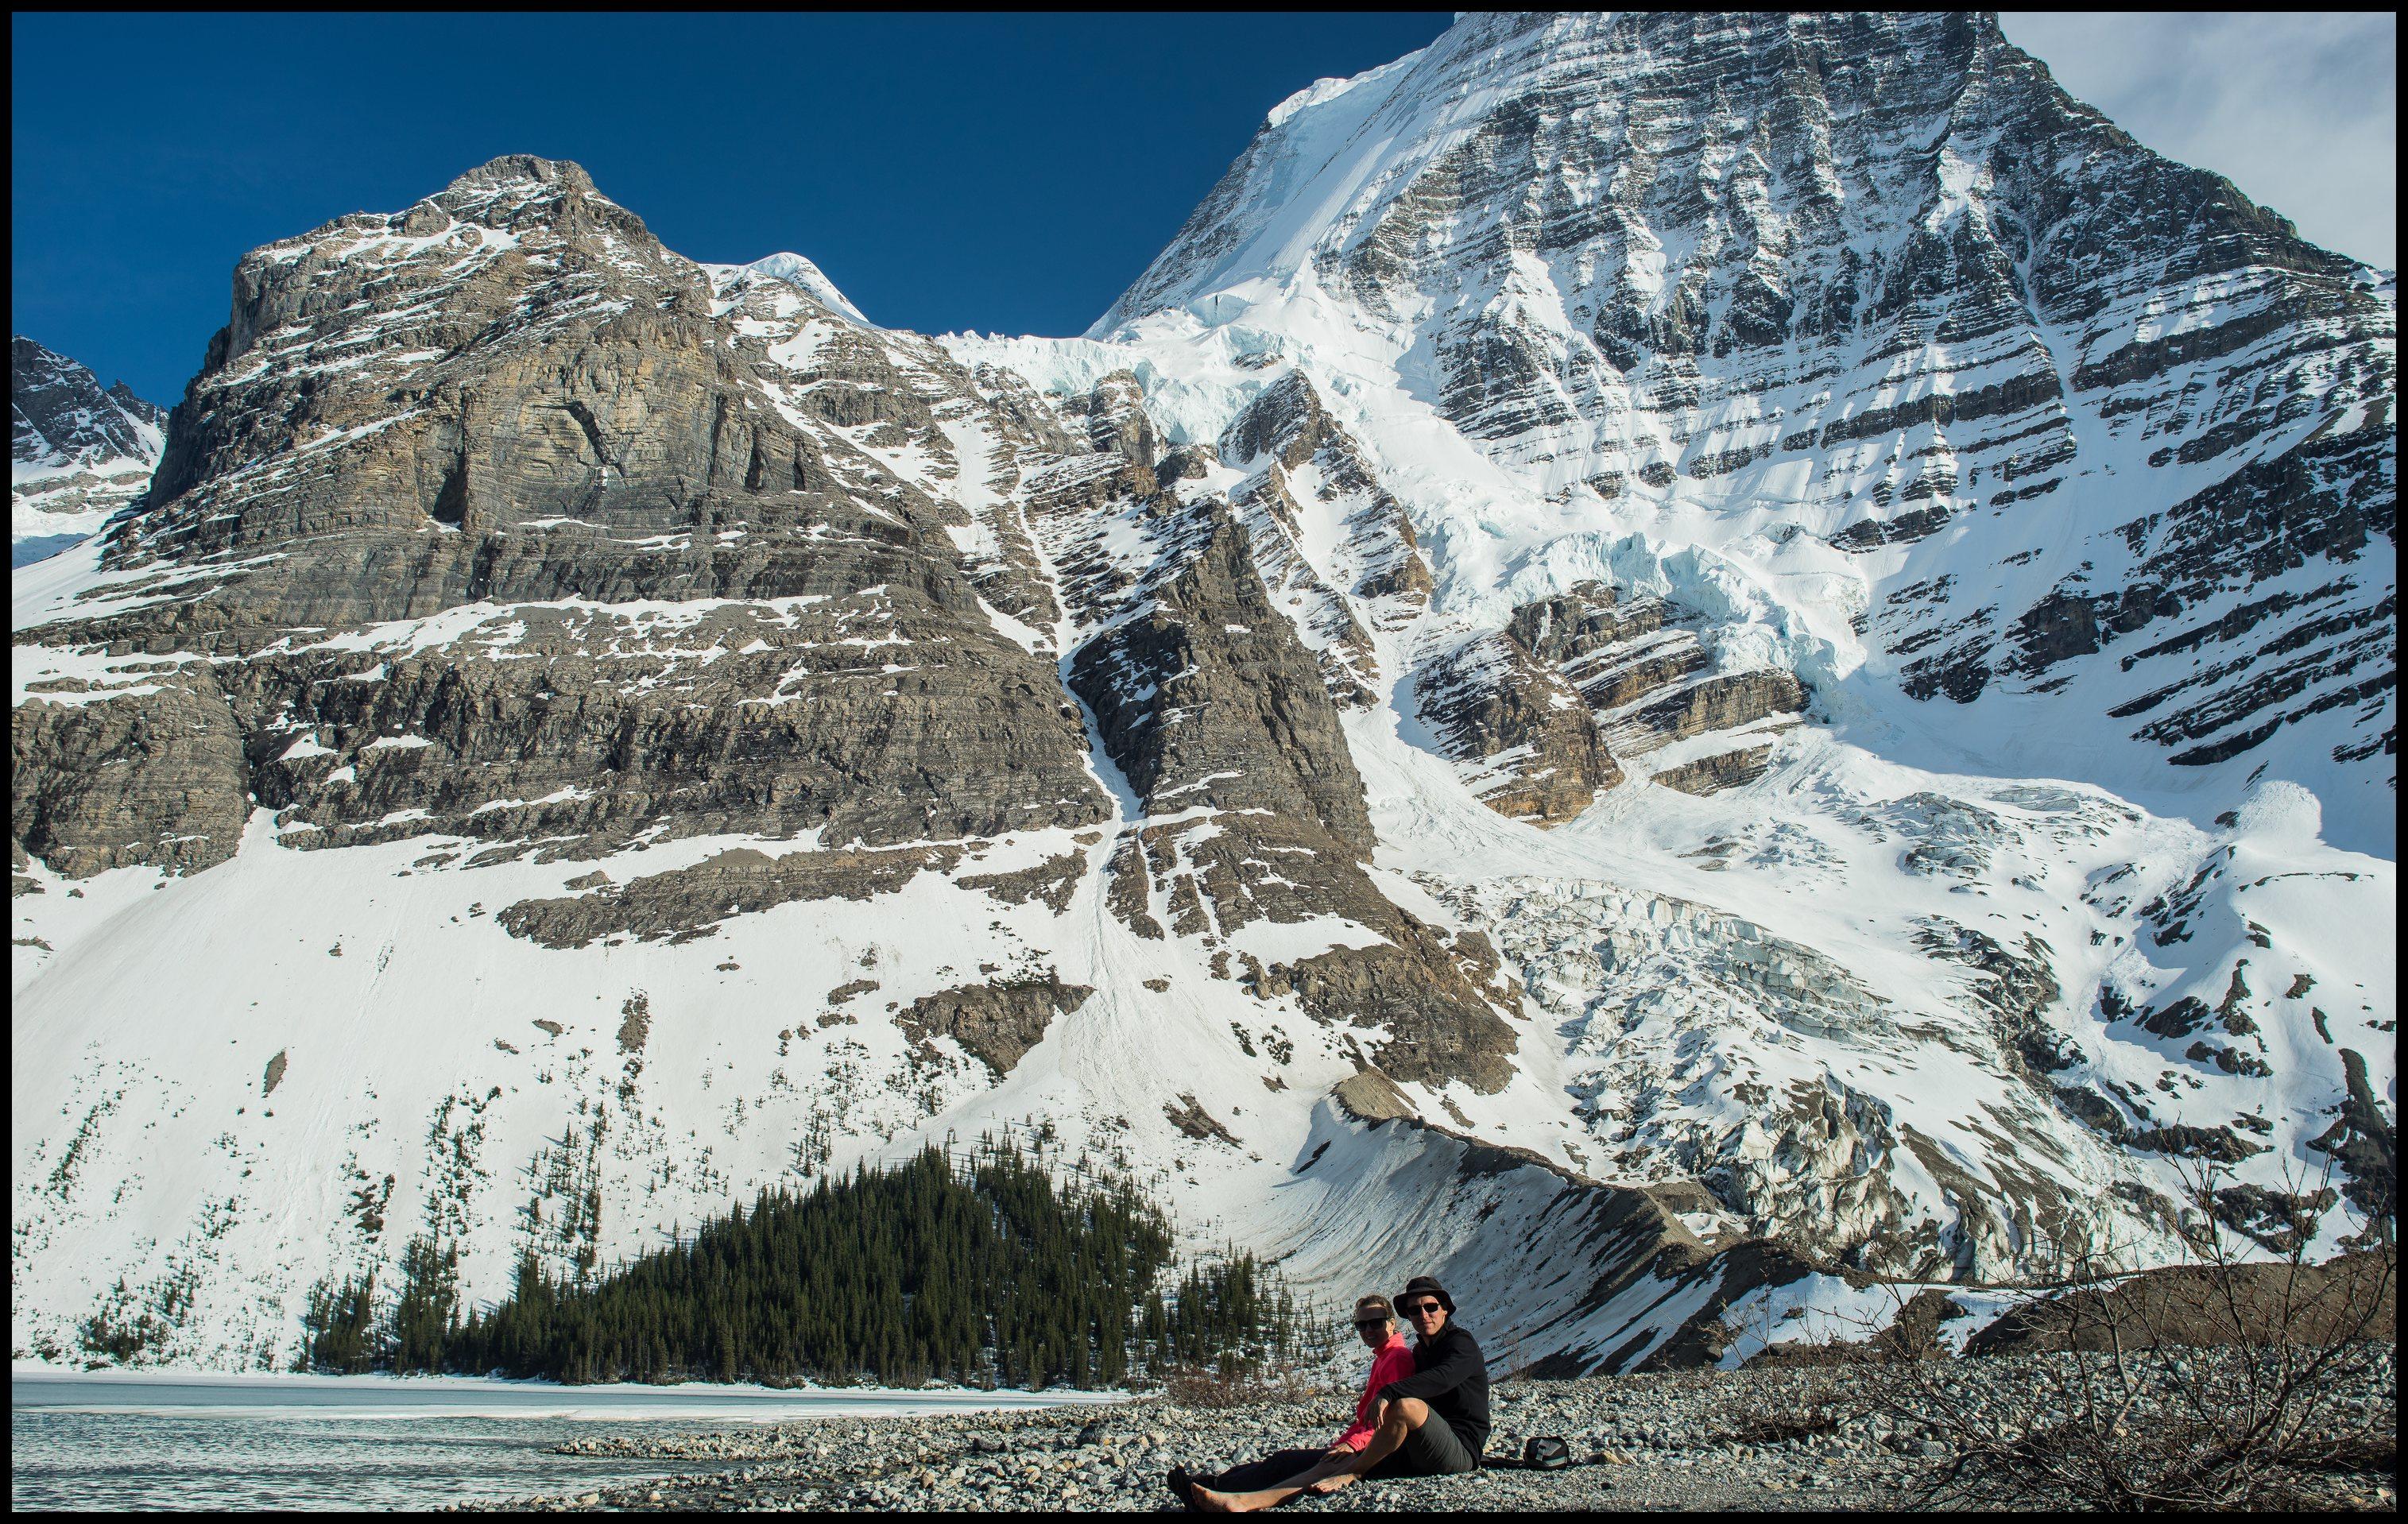 Enjoying our private Berg lake beach at Marmot campsite, Sony A7 / Canon FD Tilt Shift 35 2.8